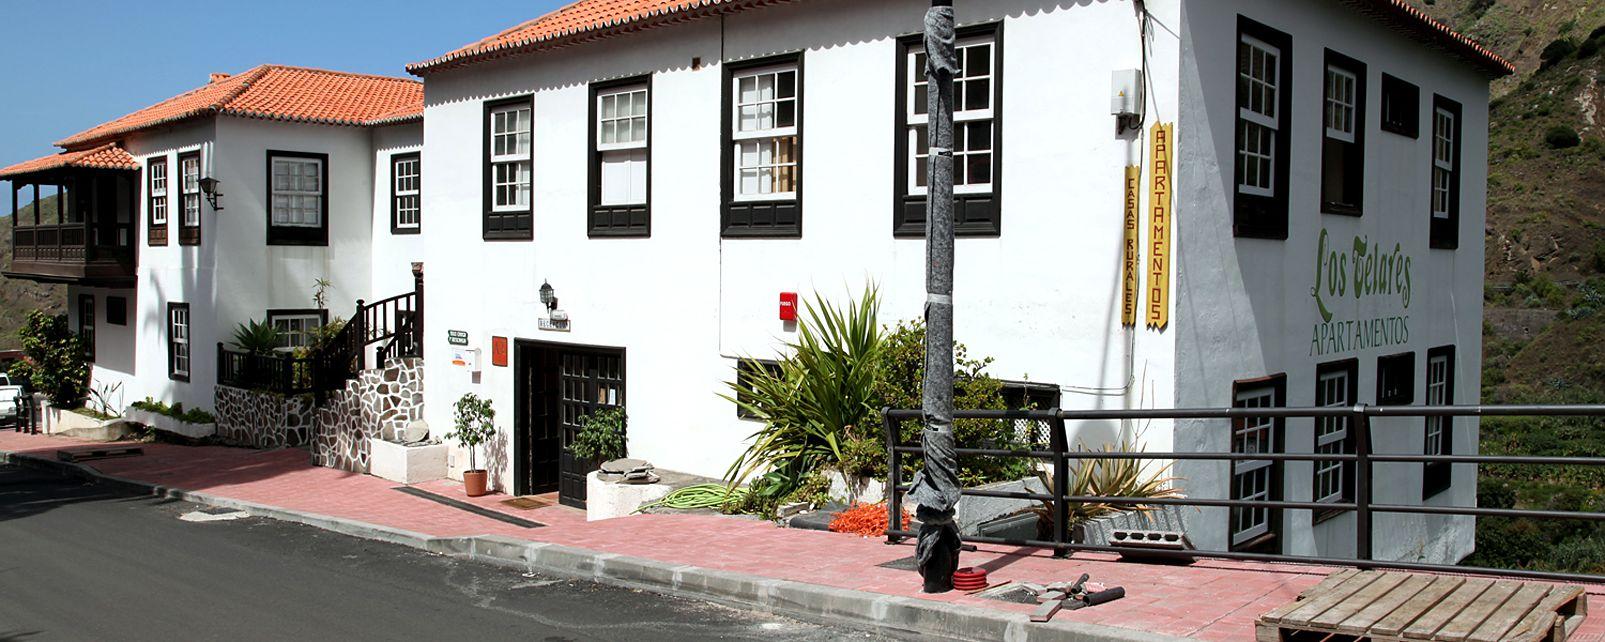 Hôtel Los Telares